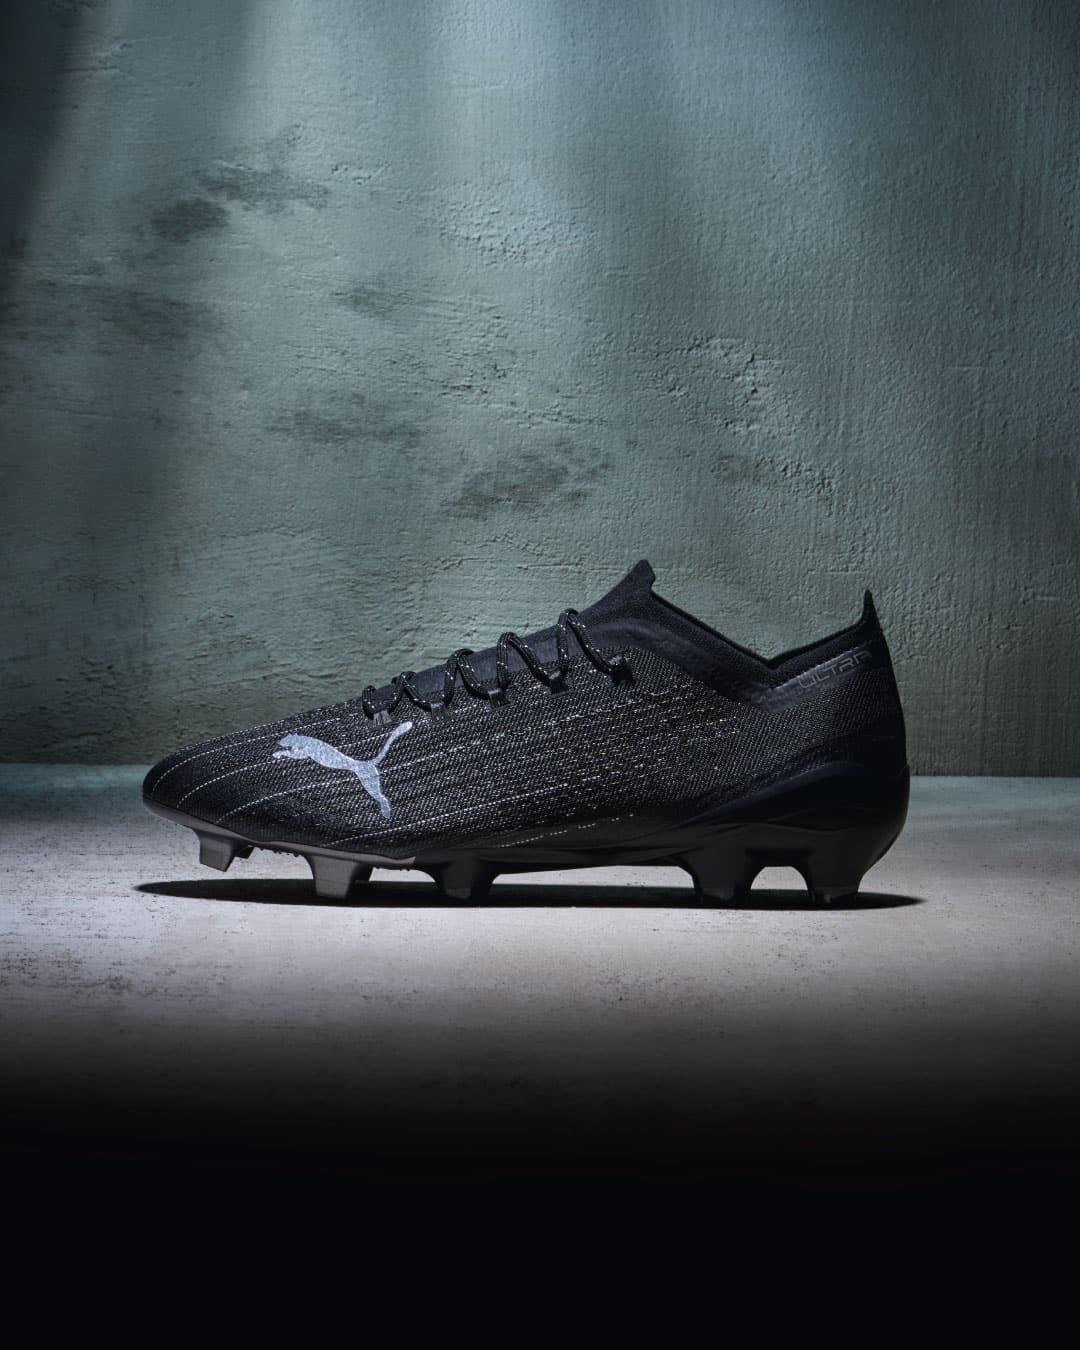 chaussures-football-puma-ultra-puma-future-z-eclipse-pack-2021-footpack-14